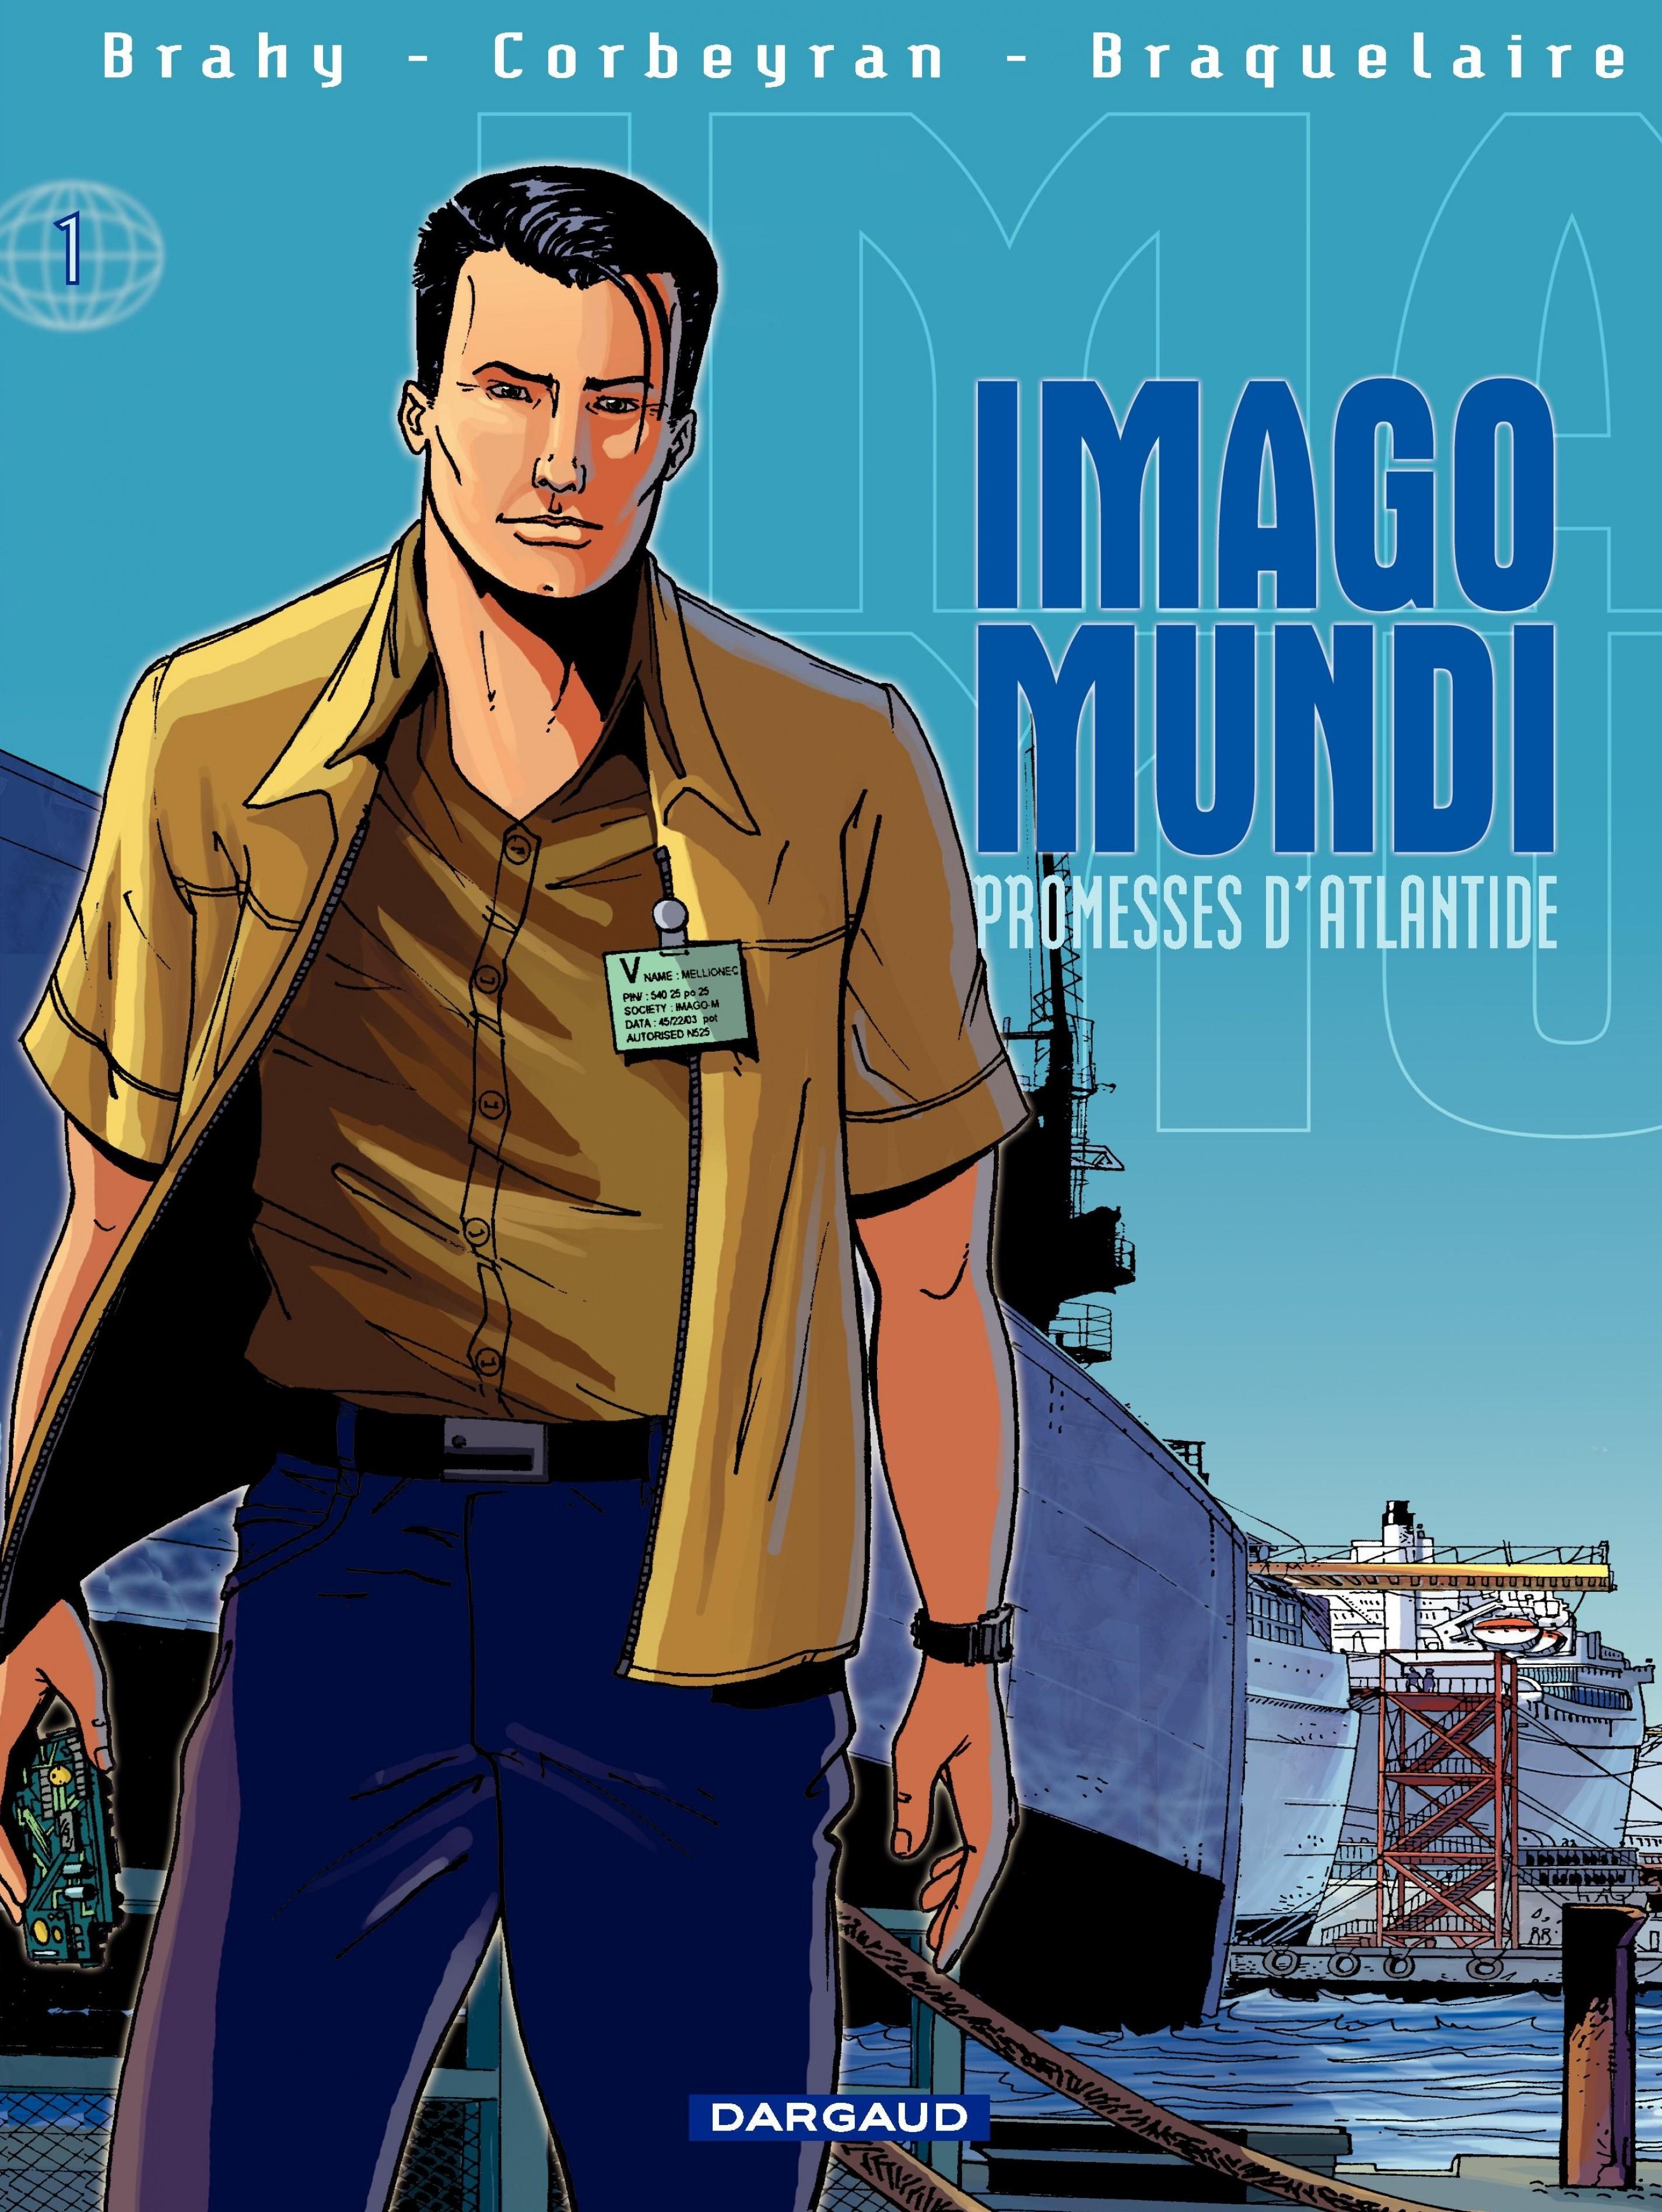 Imago Mundi - Tome 1 - Promesses d'Atlantide